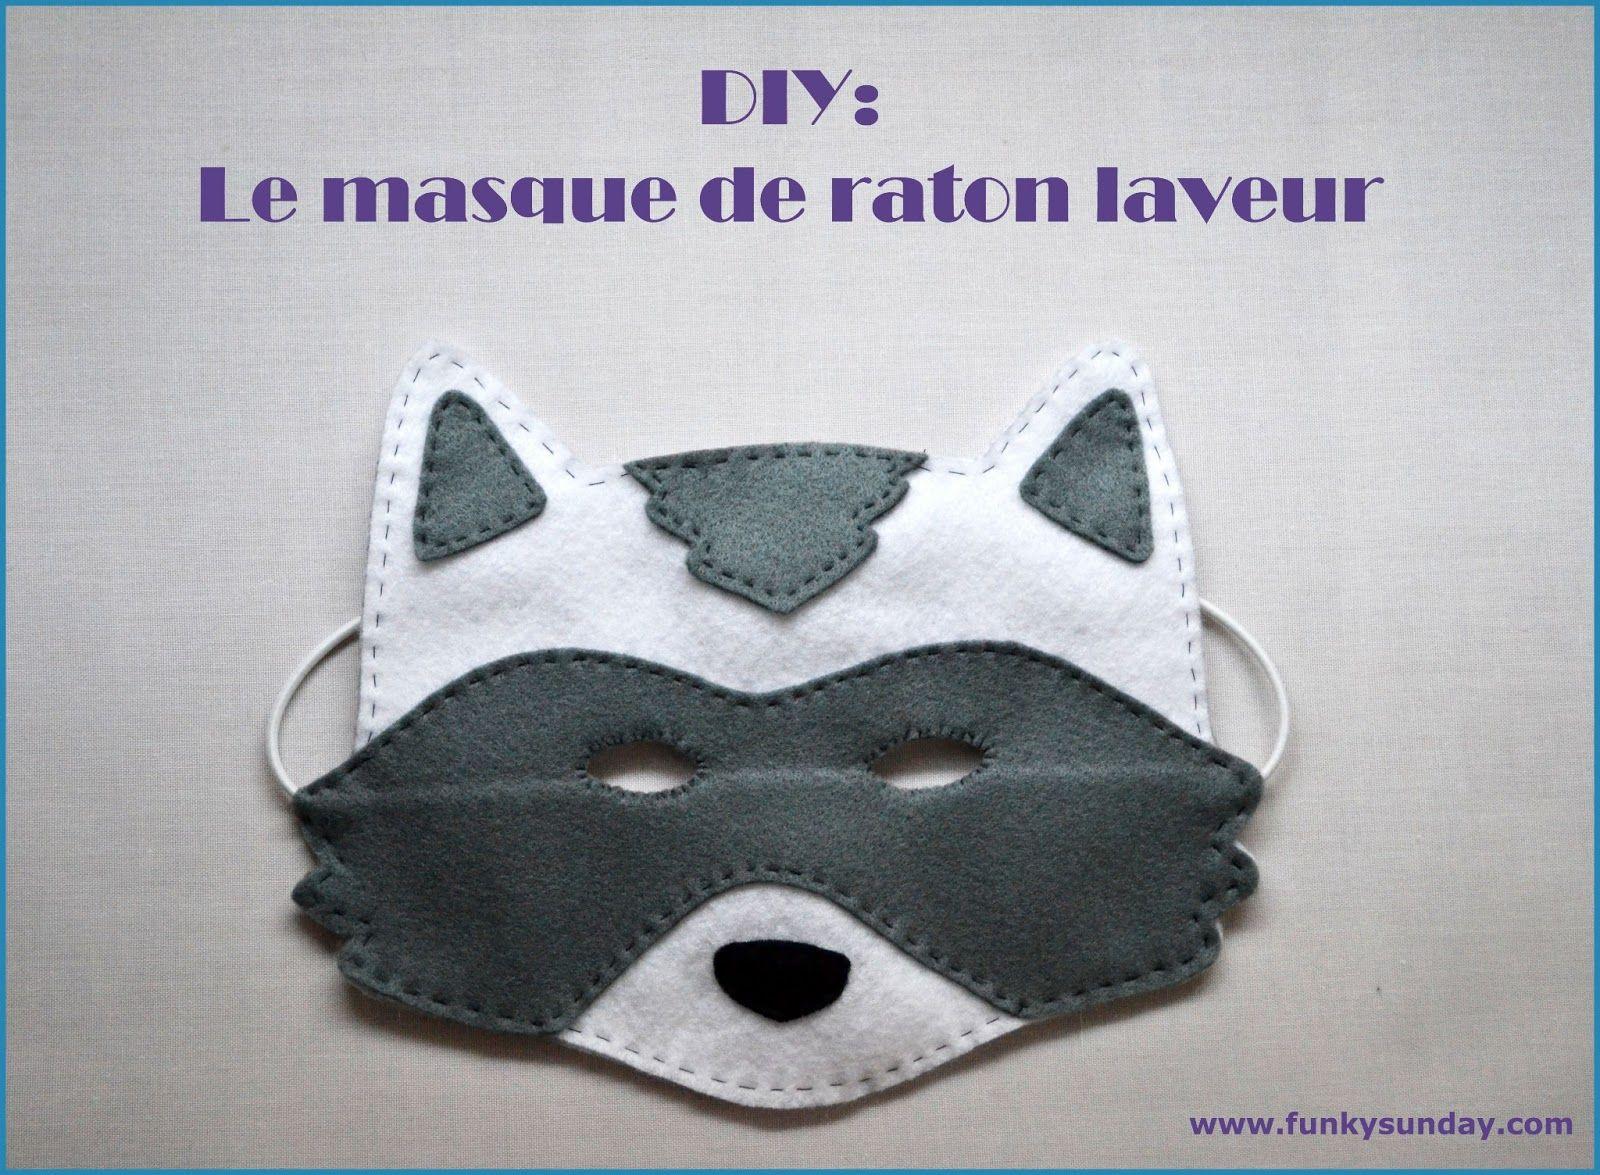 Funky Sunday Diy Le Masque De Carnaval Raton Laveur